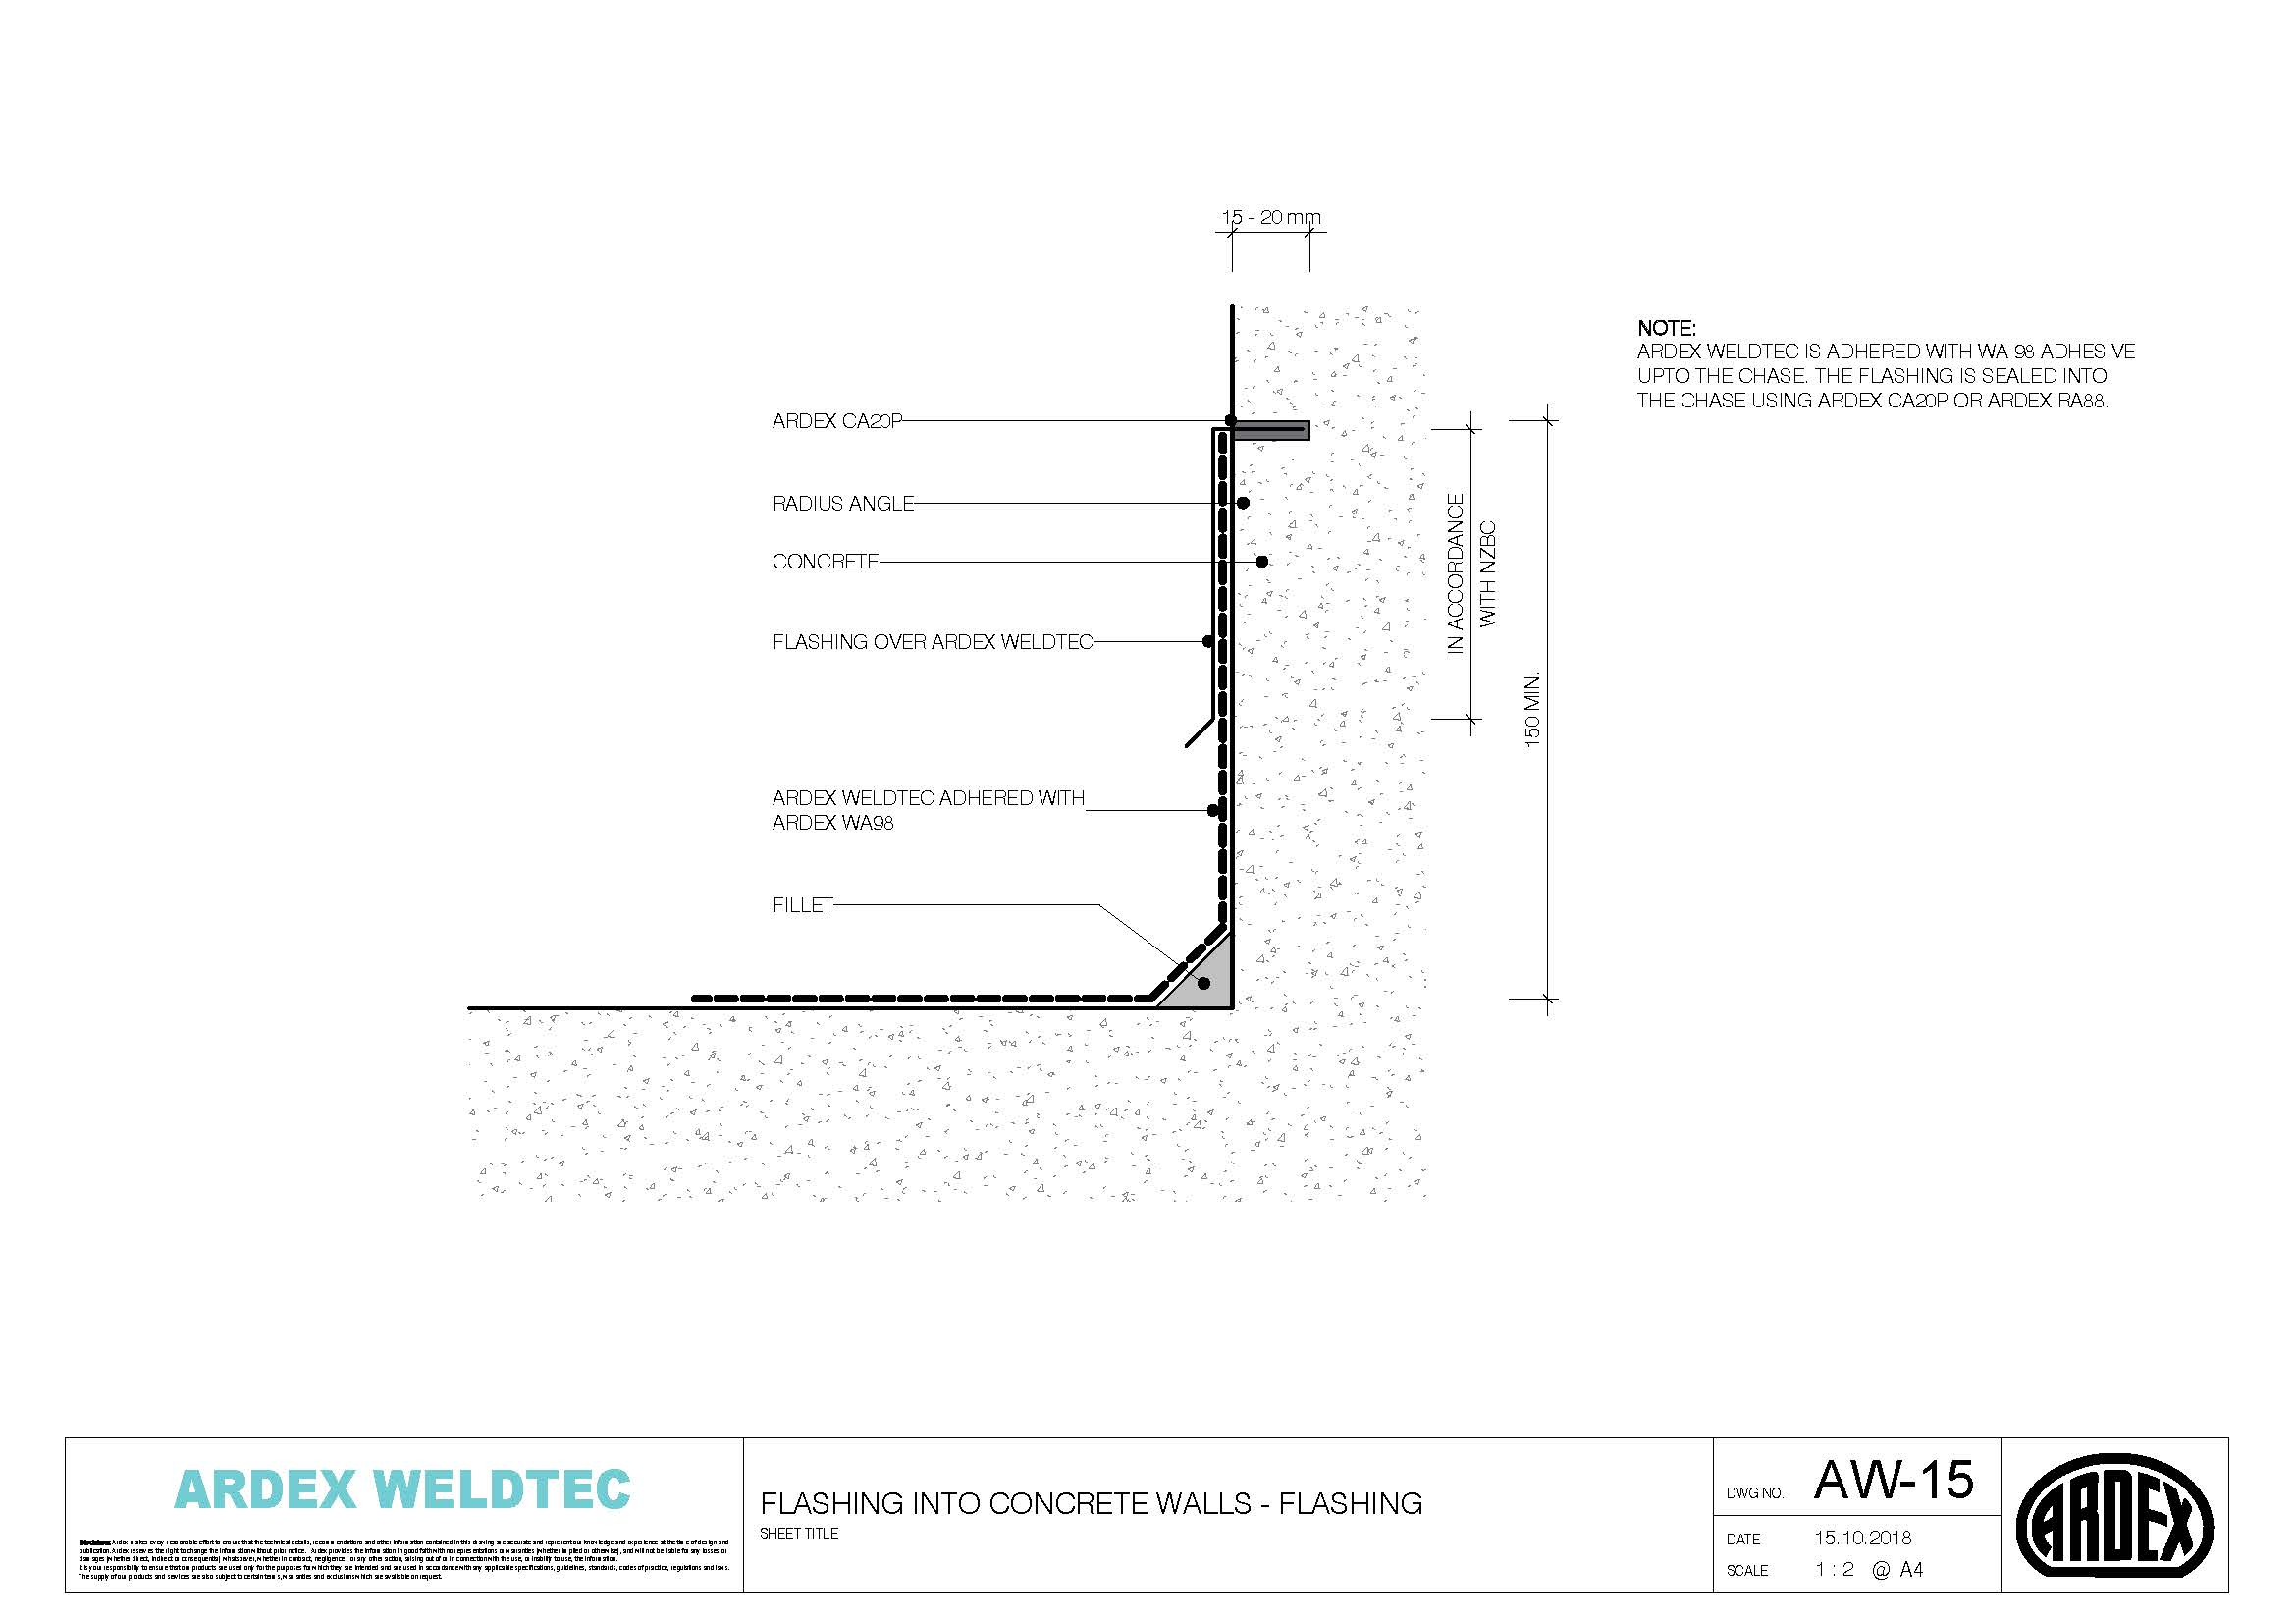 Weldtec flashing into concrete walls